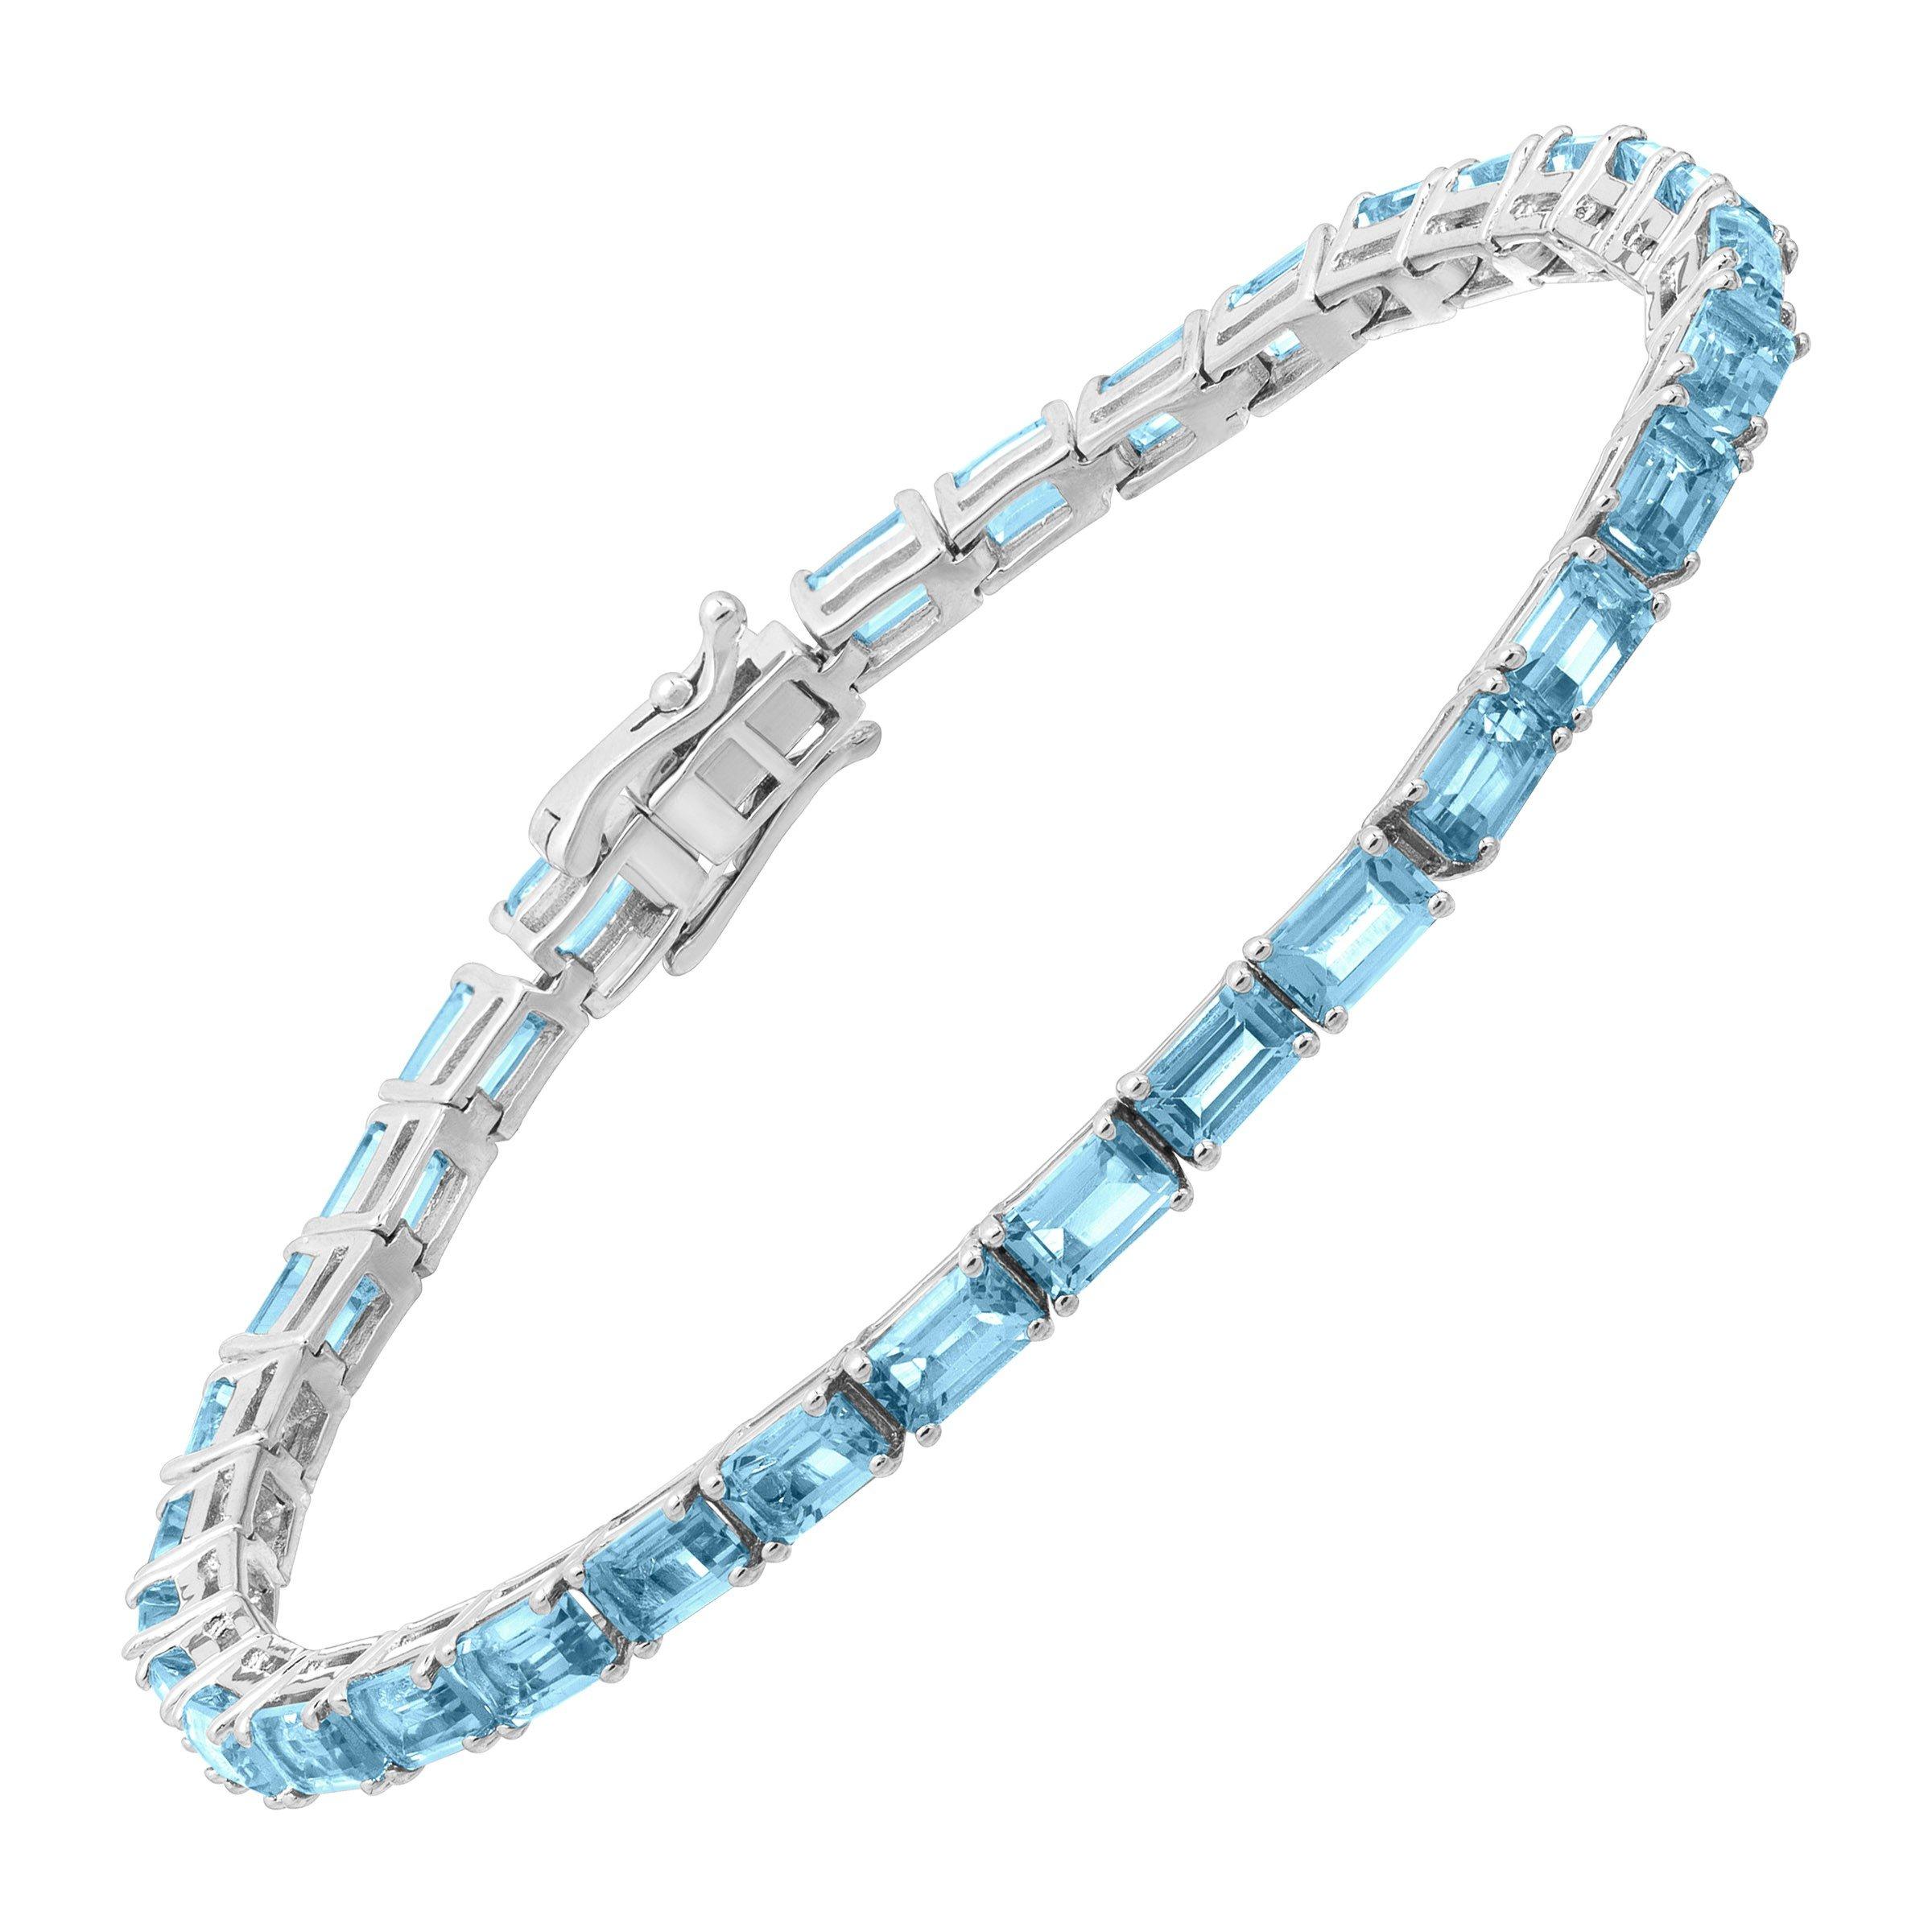 7 1/2 ct Natural Swiss Blue Topaz Emerald-Cut Tennis Bracelet in Sterling Silver, 7''